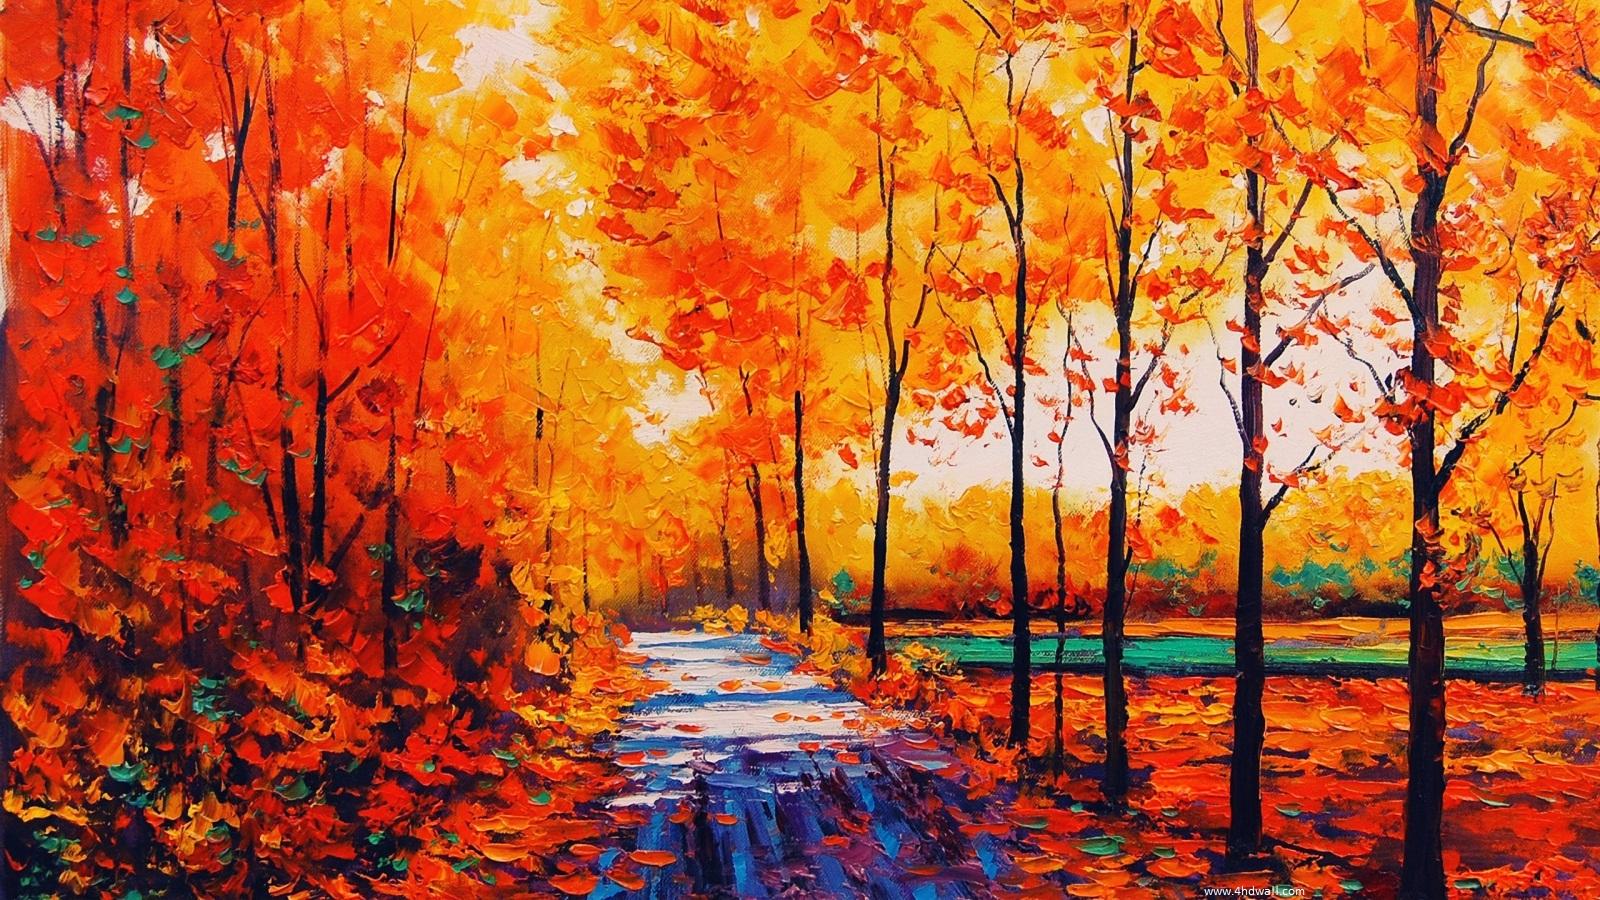 Fall Season Desktop Background HD Wallpaper